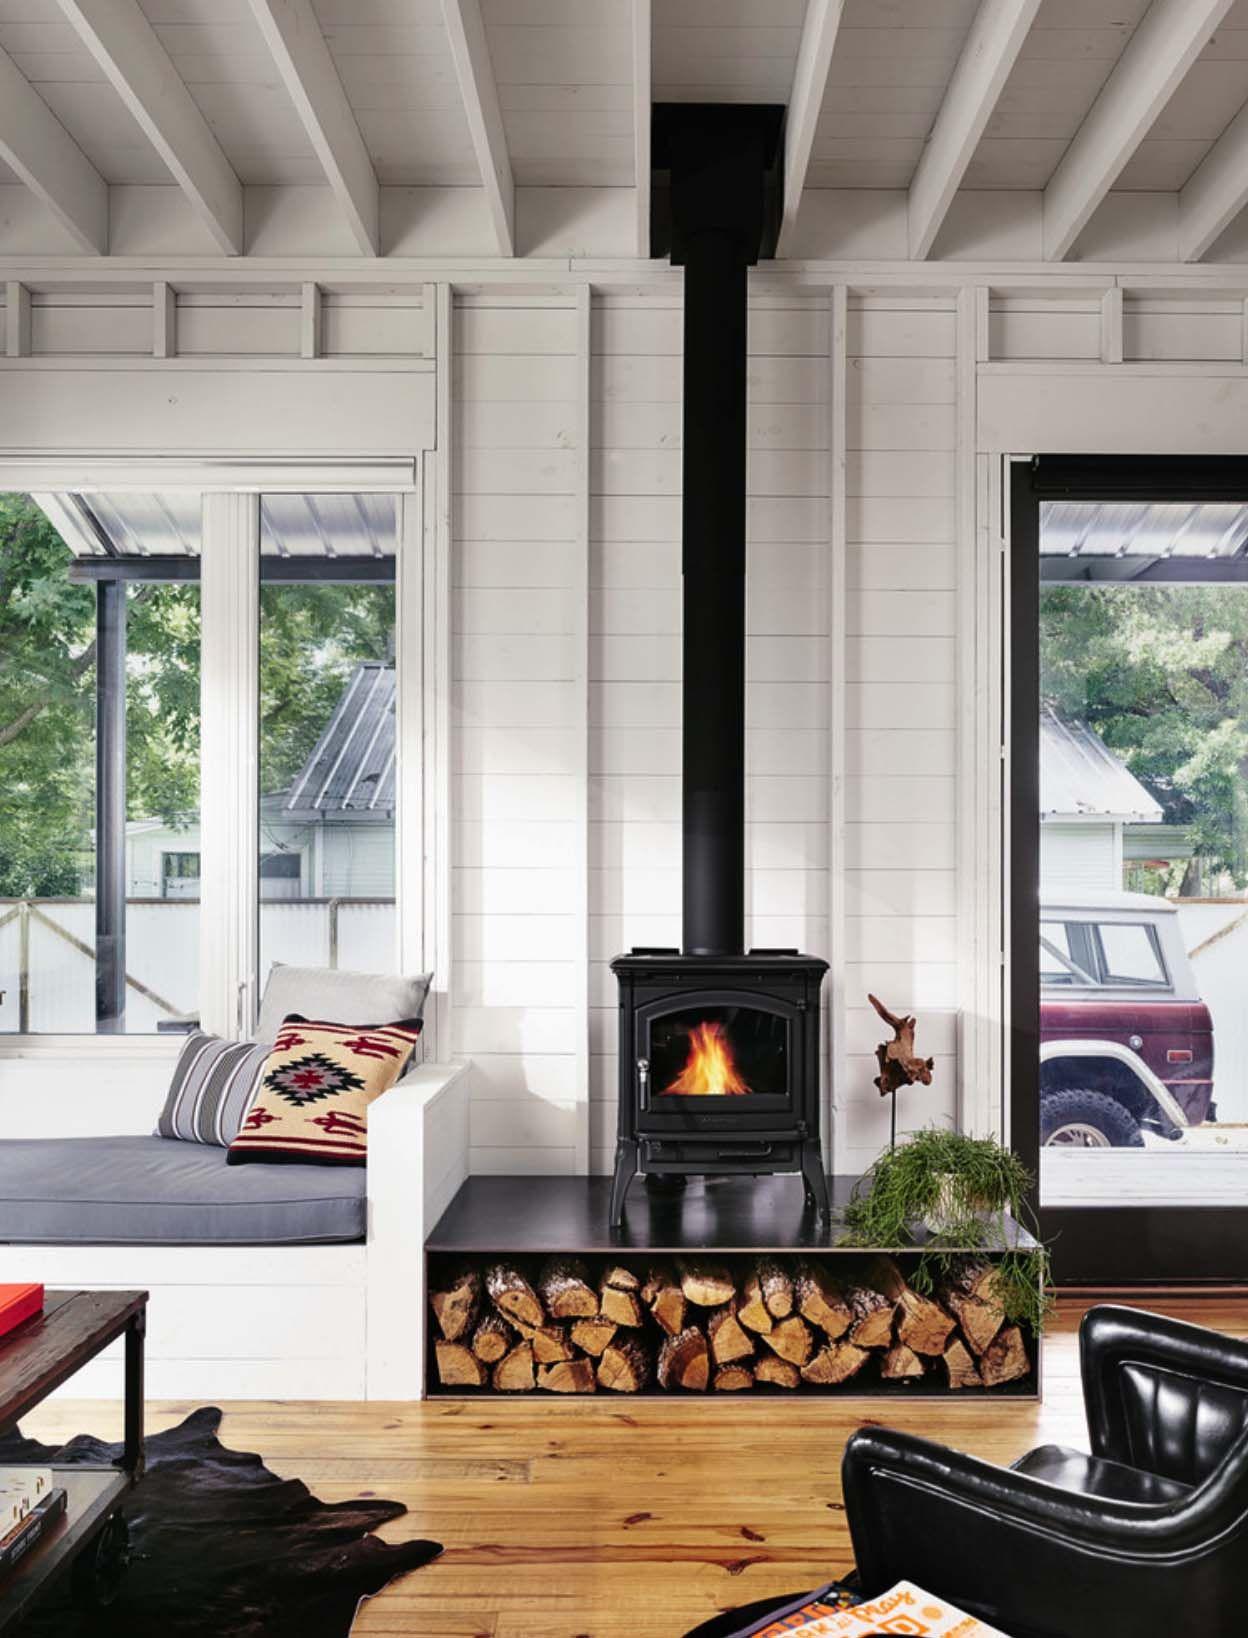 Small energy-efficient farmhouse in Austin designed for a bachelor #modernfarmhousestyle